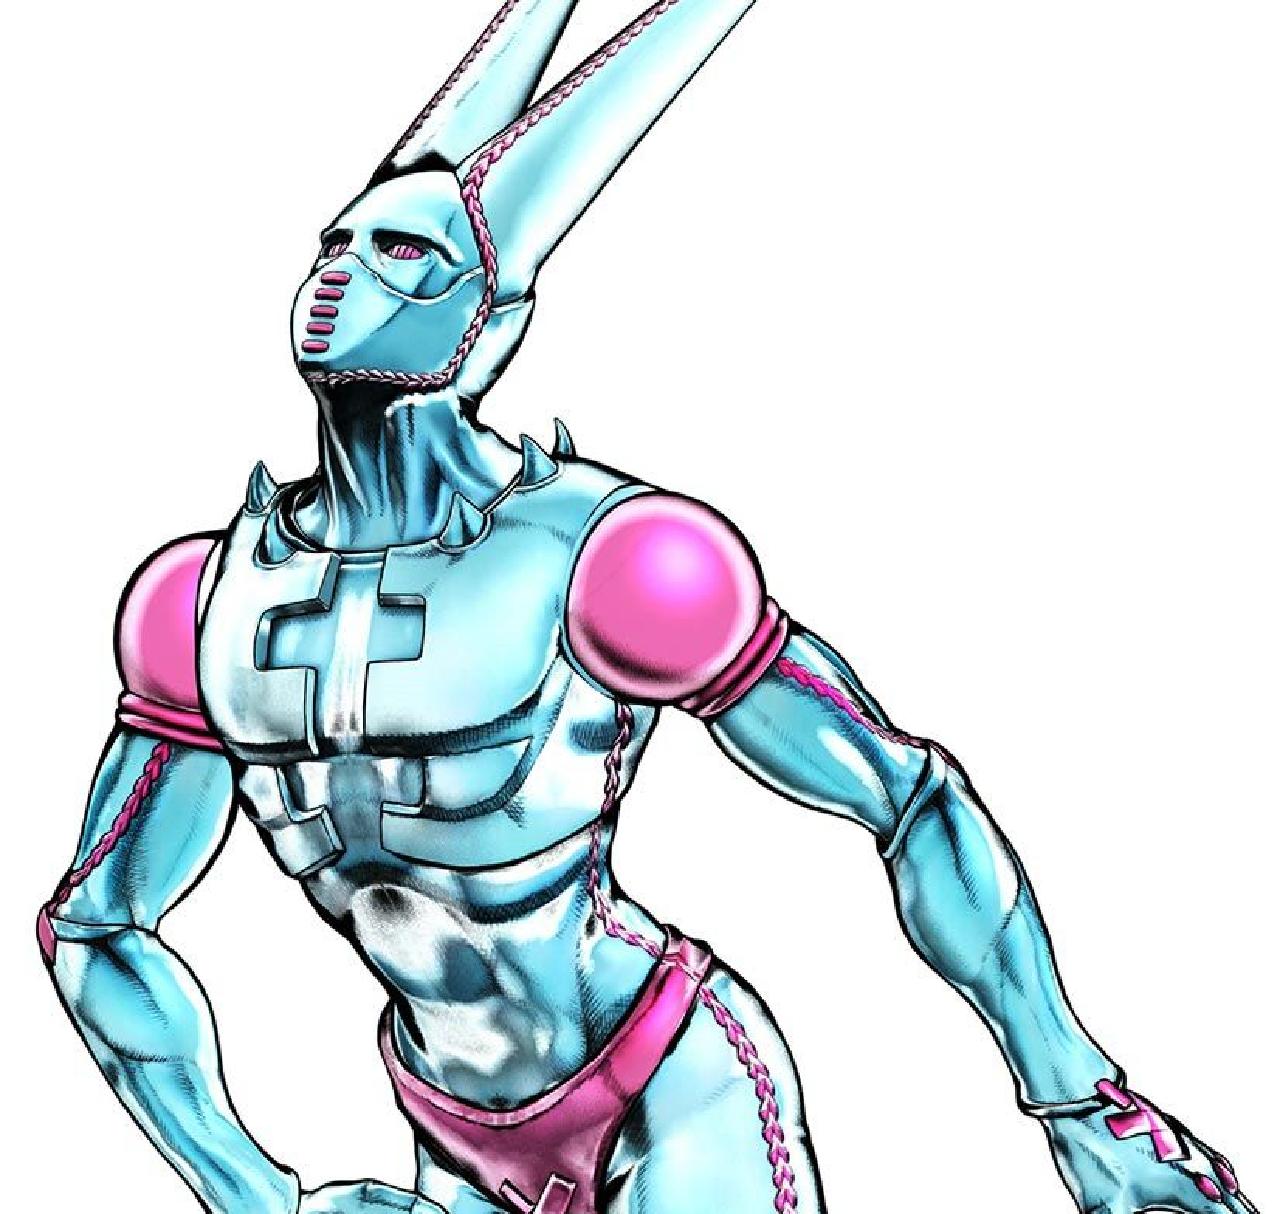 personajes de jojos bizarre adventure steel ball run